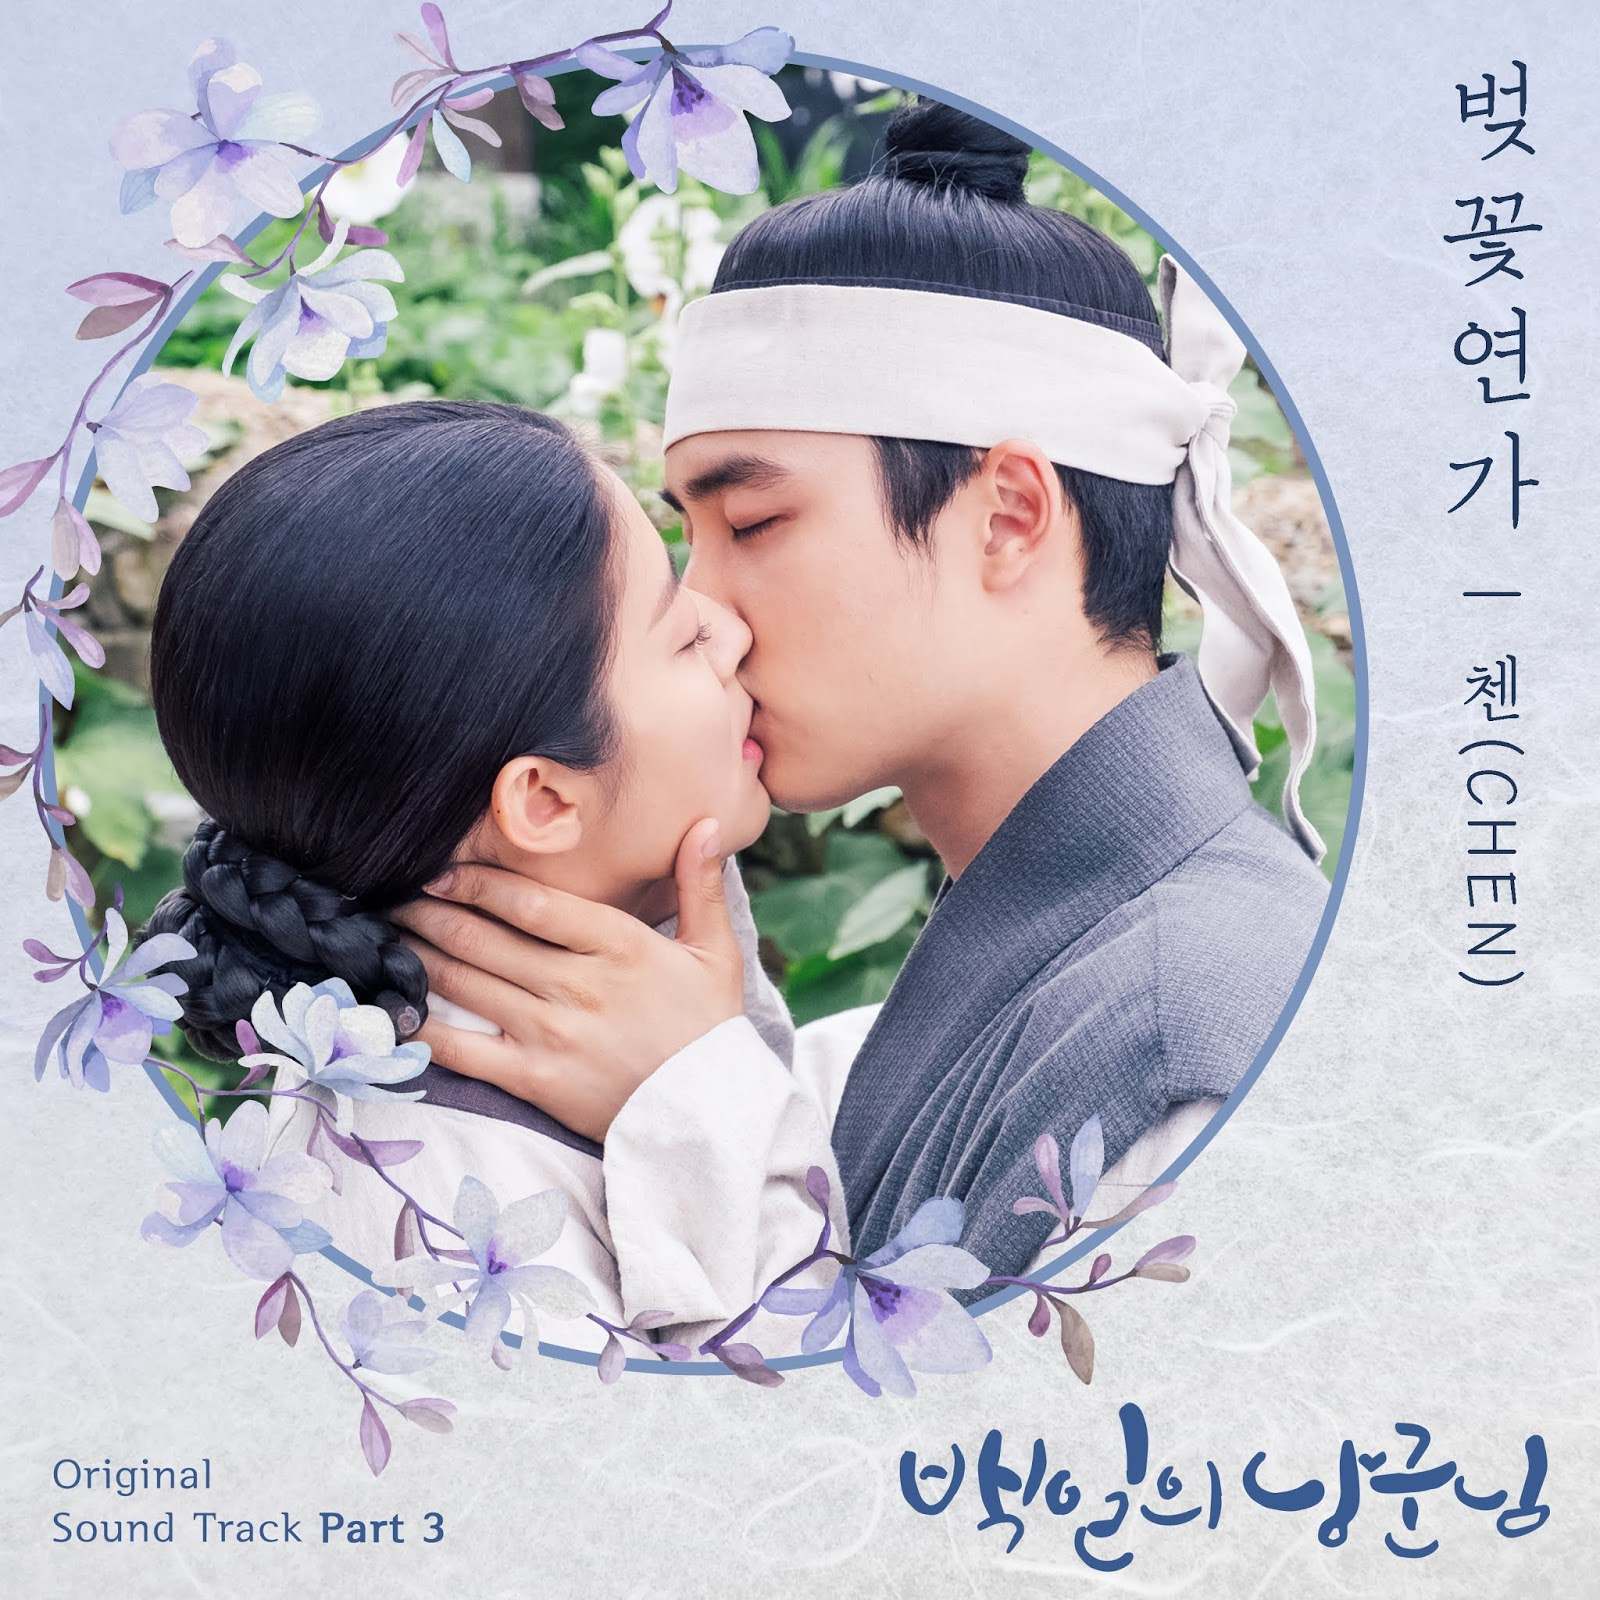 Chen dating Luna